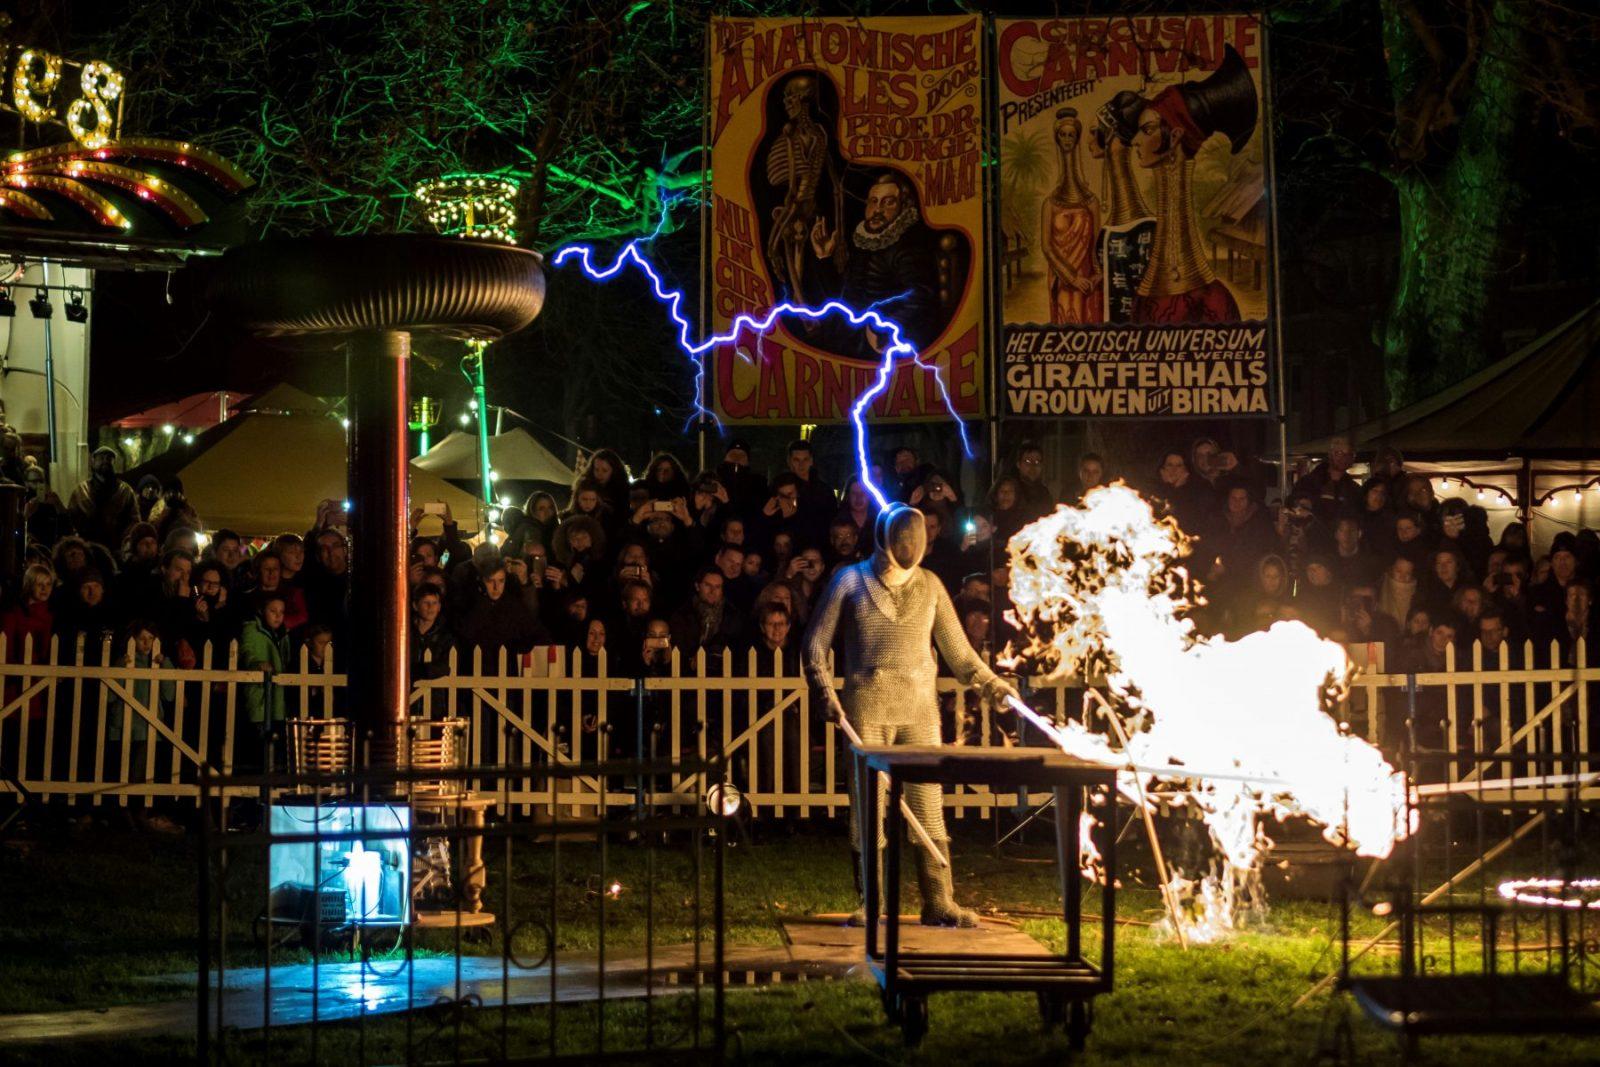 Carnivale Huygenspark 2017 - Valerie Kuipers